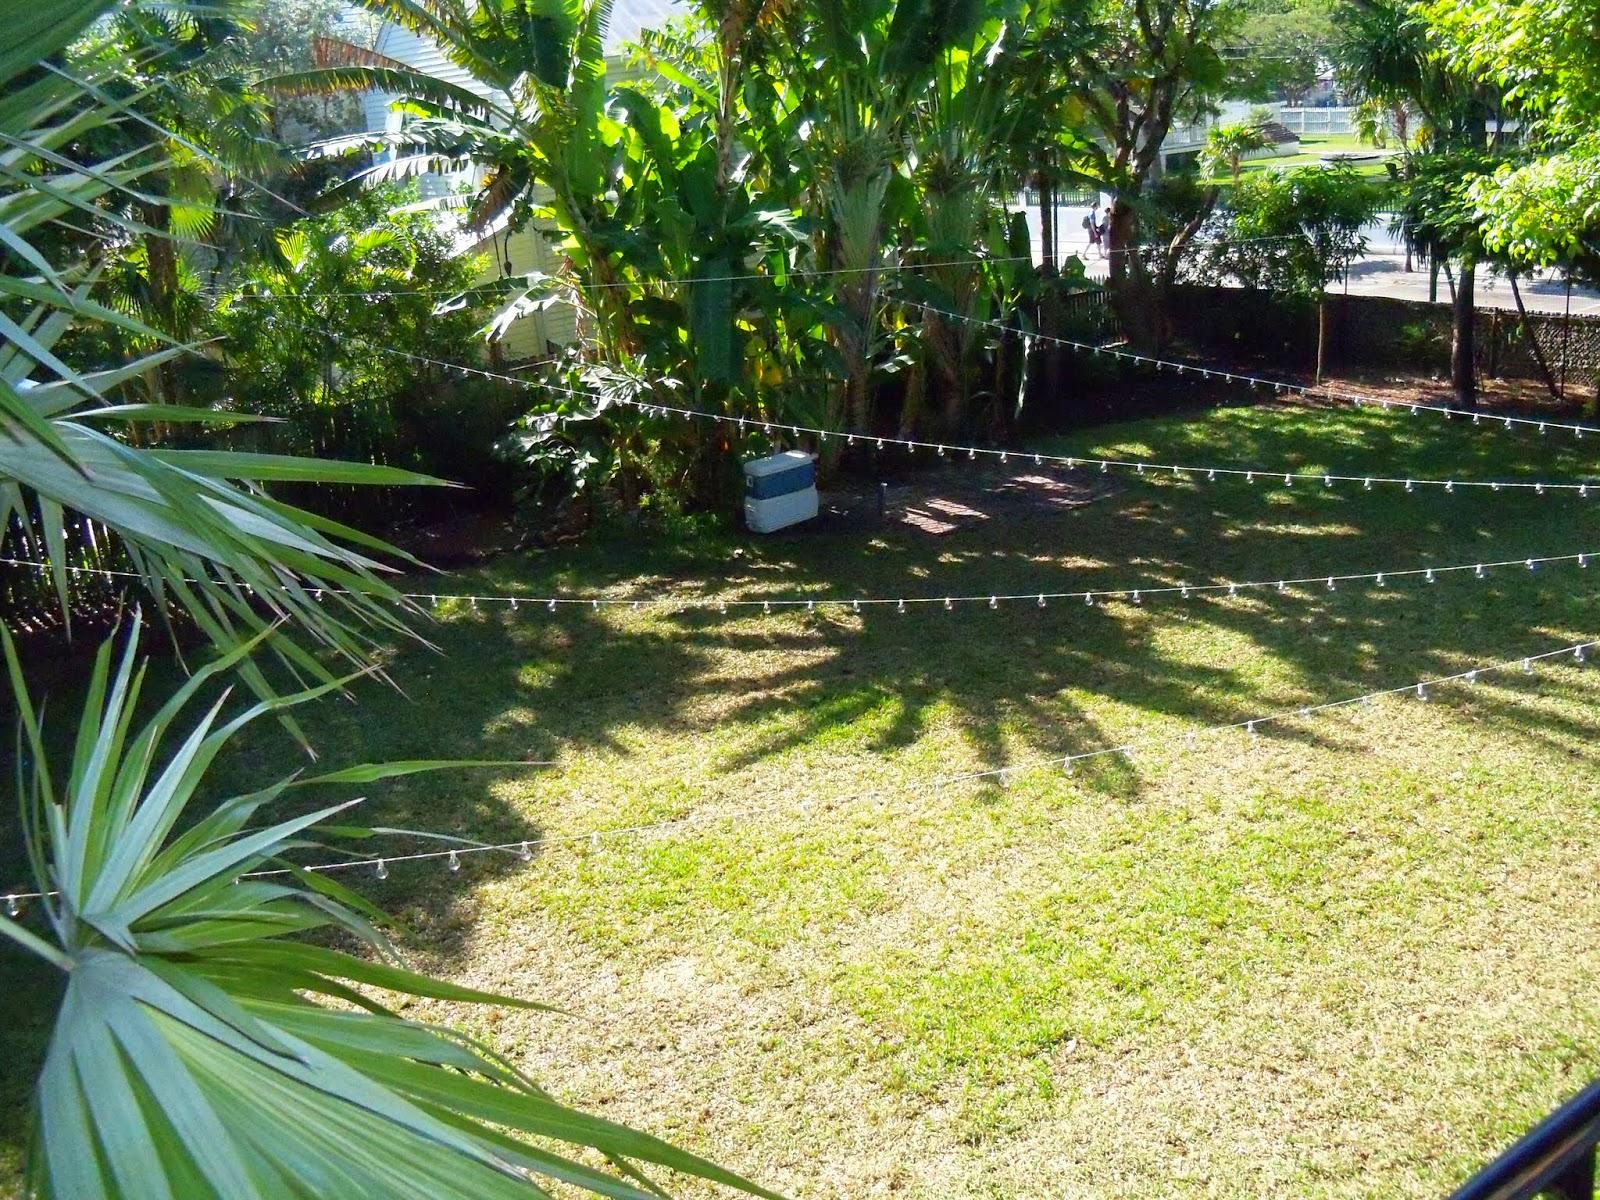 Key West Vacation - 116_5439.JPG